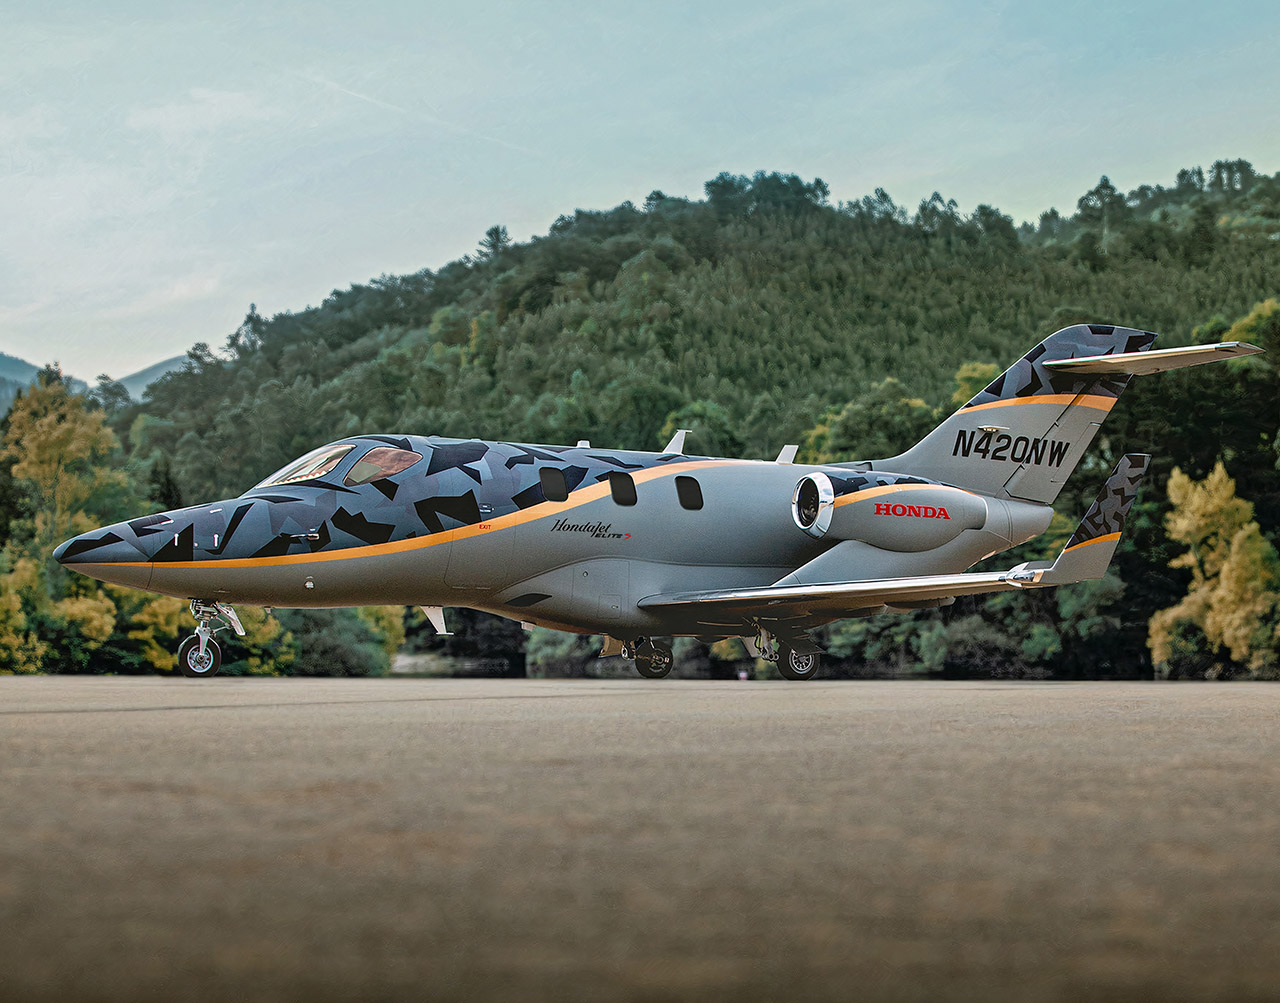 HondaJet Elite S Private Business Jet Plane